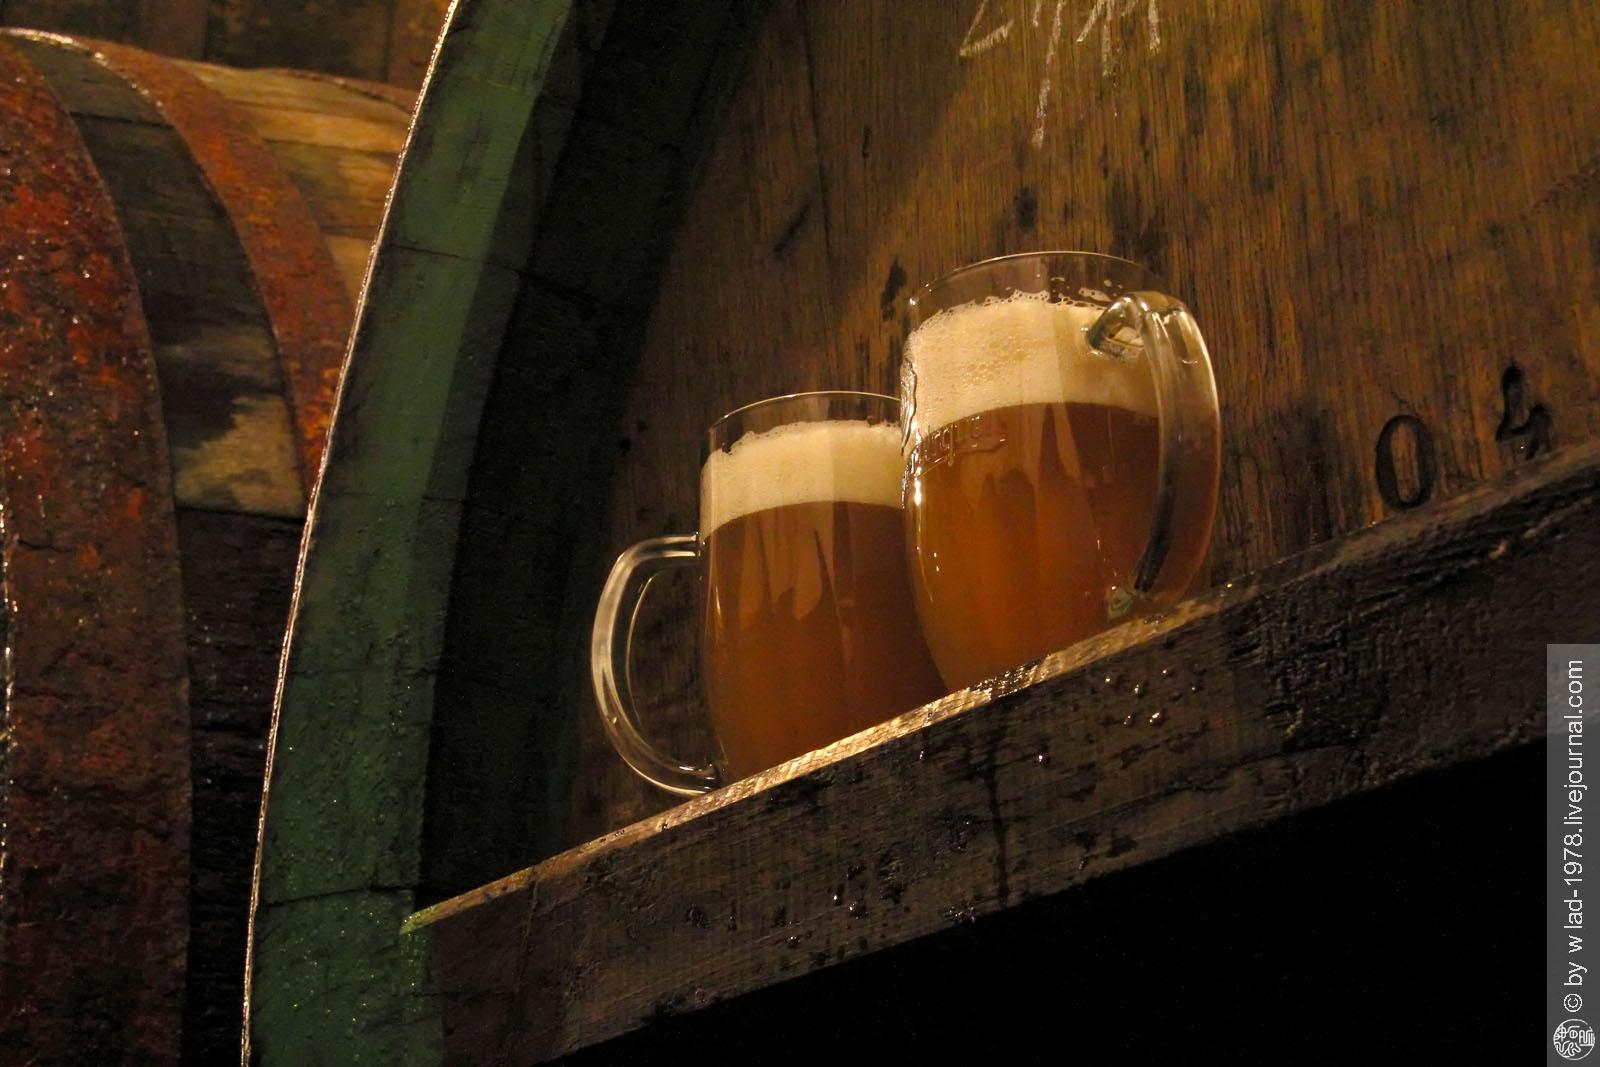 Prohlídka Pilsner Urquell, Pilsner Urquell, Ležácké sklepy